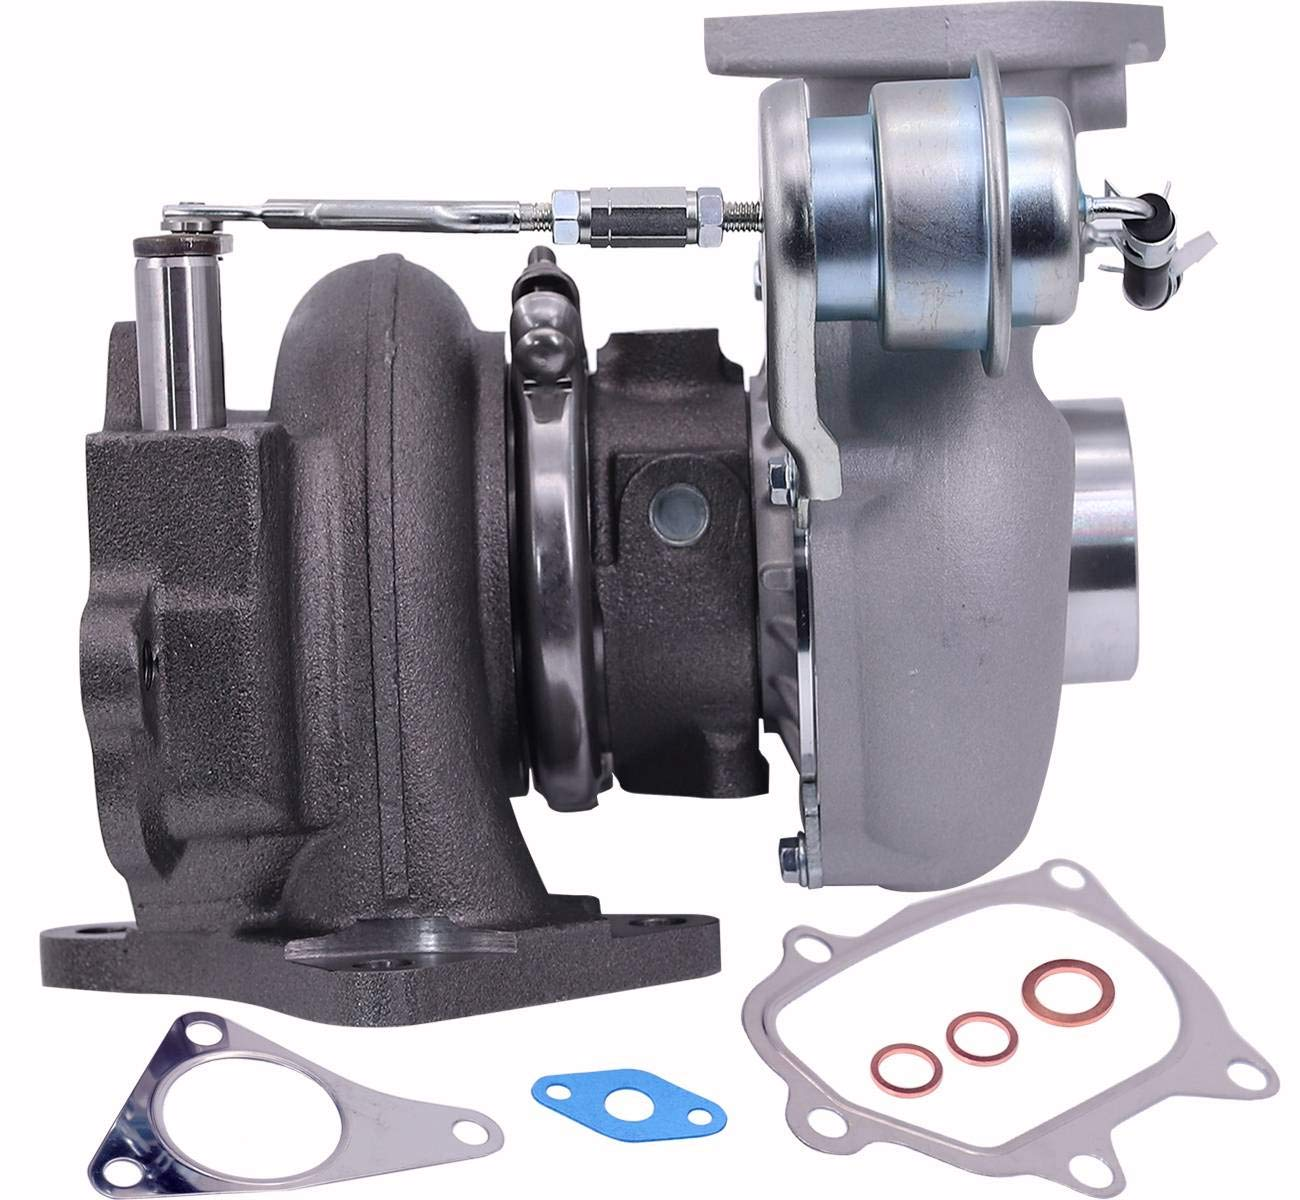 14411AA800 Turbo Turbocharger for Subaru Impreza Outnack XT Legacy WRX 2009-2014